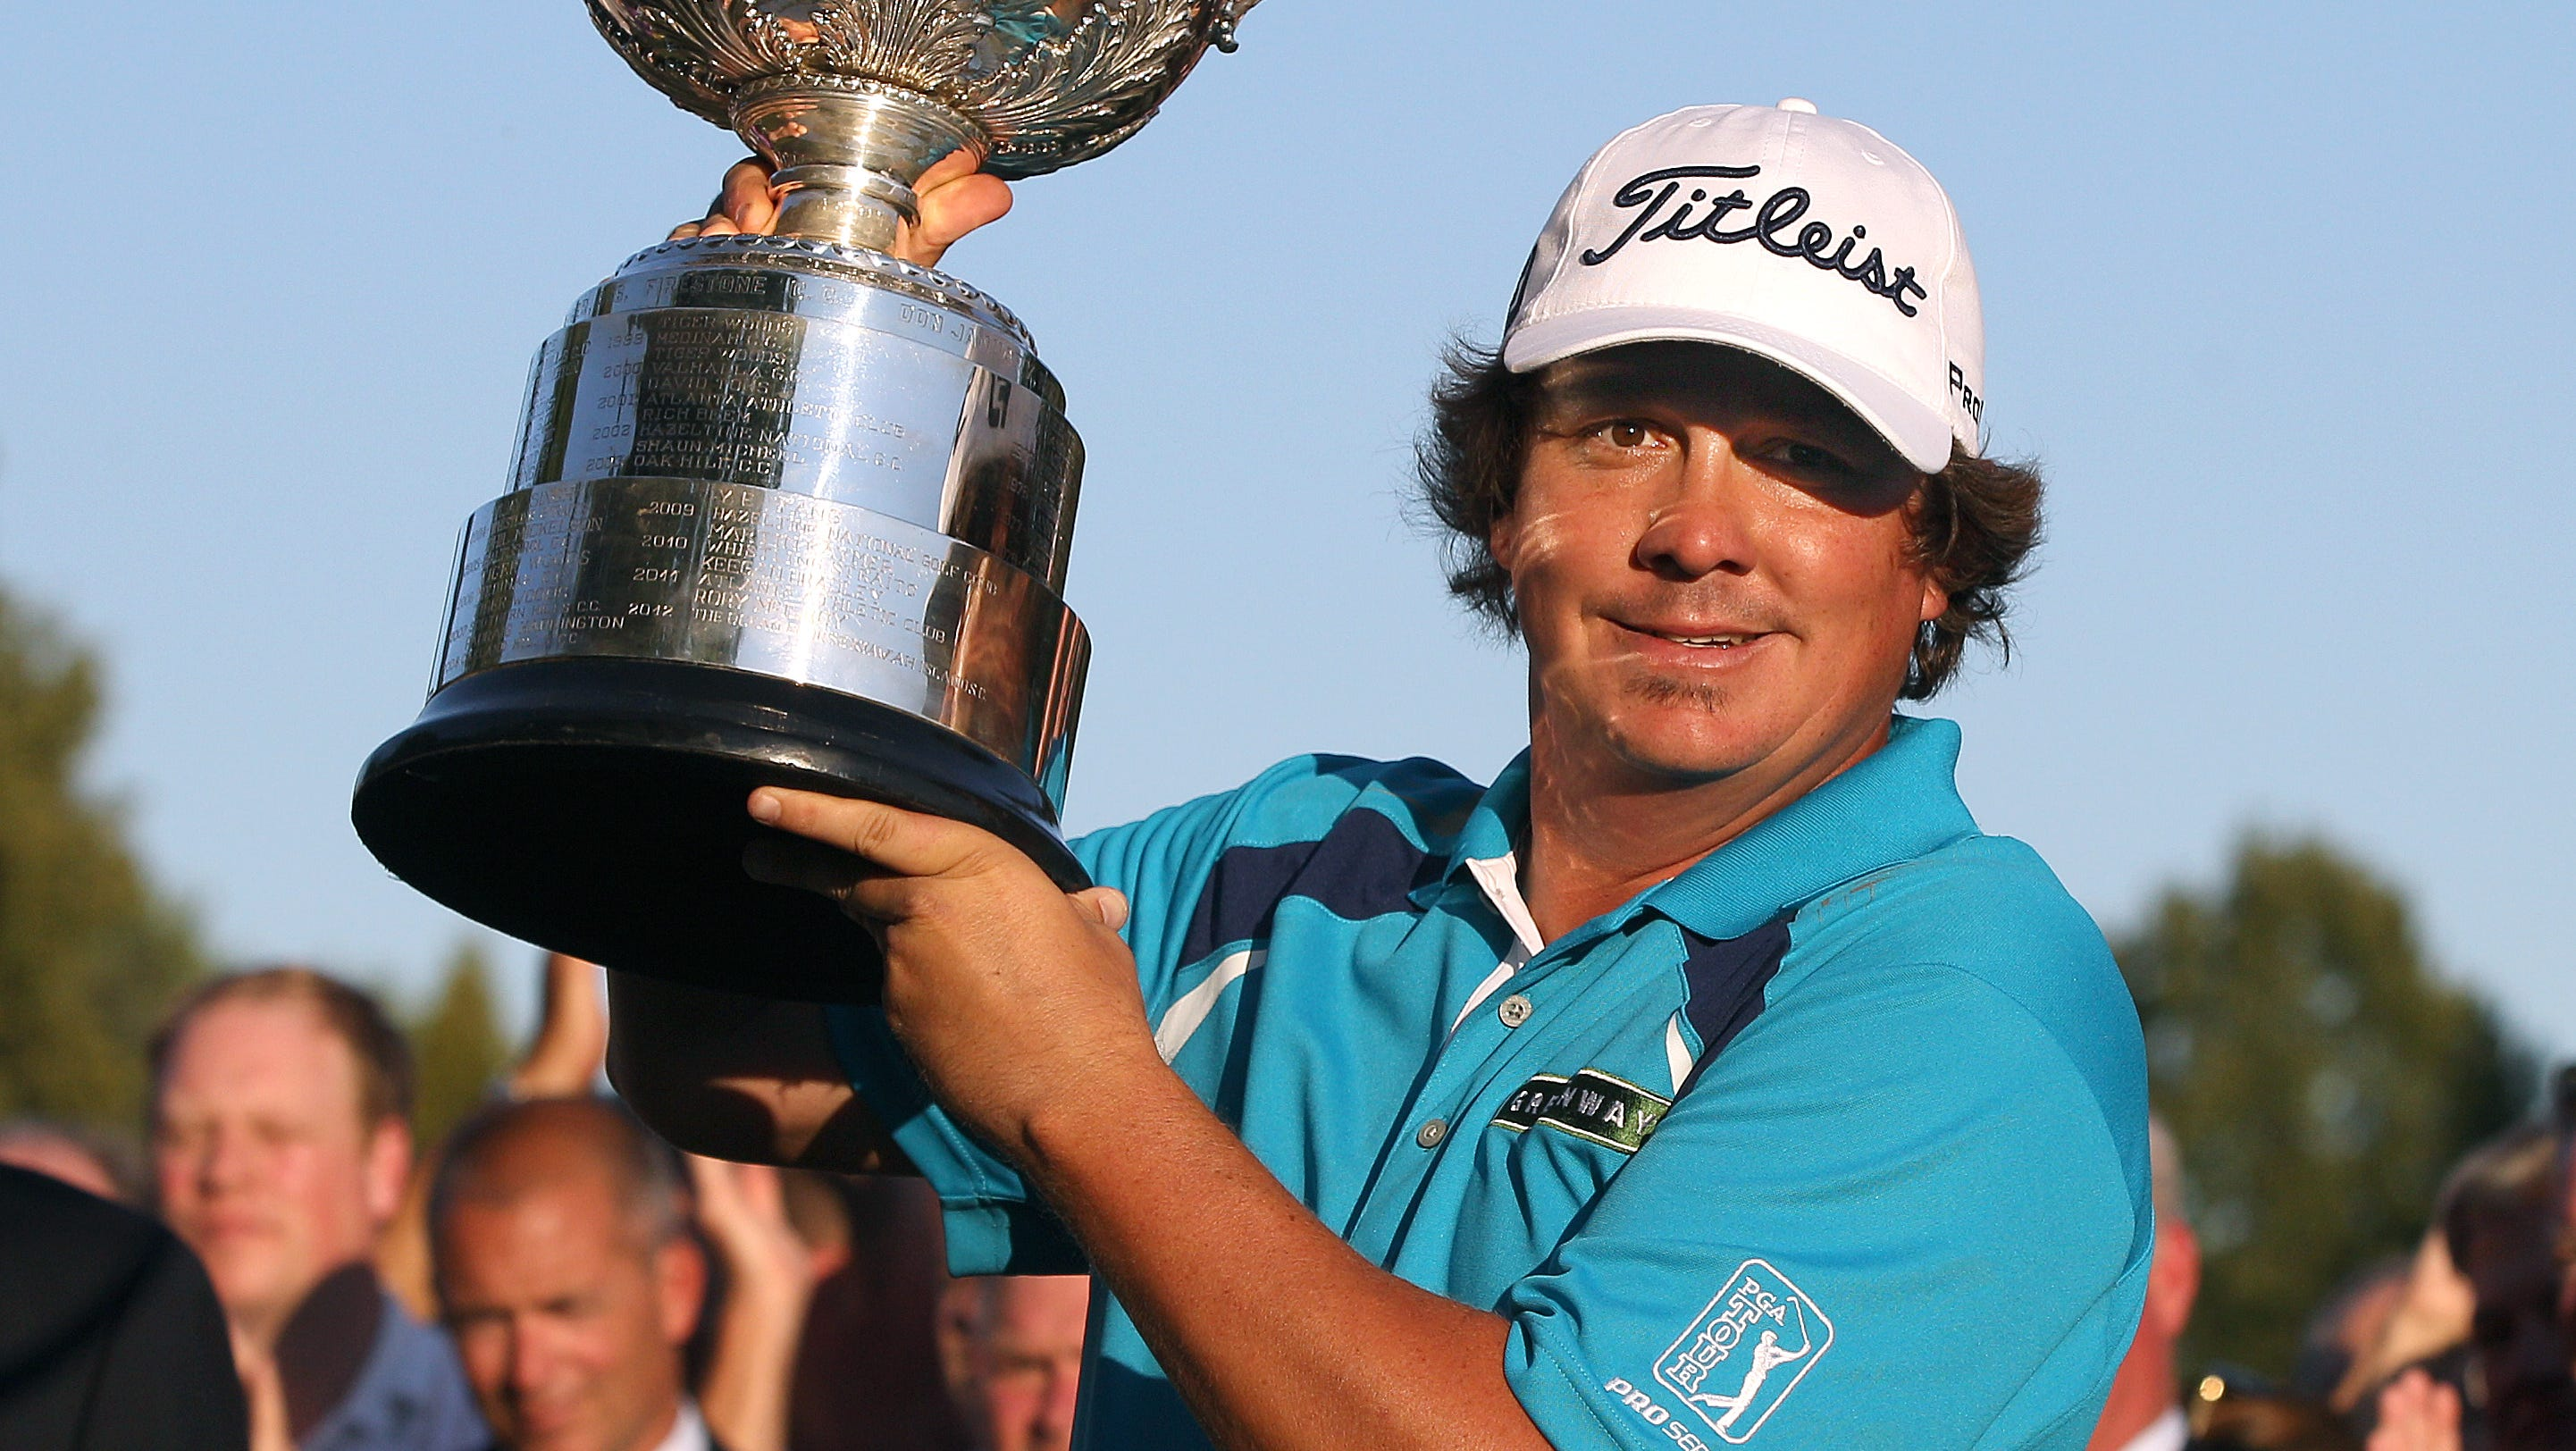 Jason Dufner raises the Wanamaker trophy after winning the 2013 PGA Championship beating Jim Furyk.